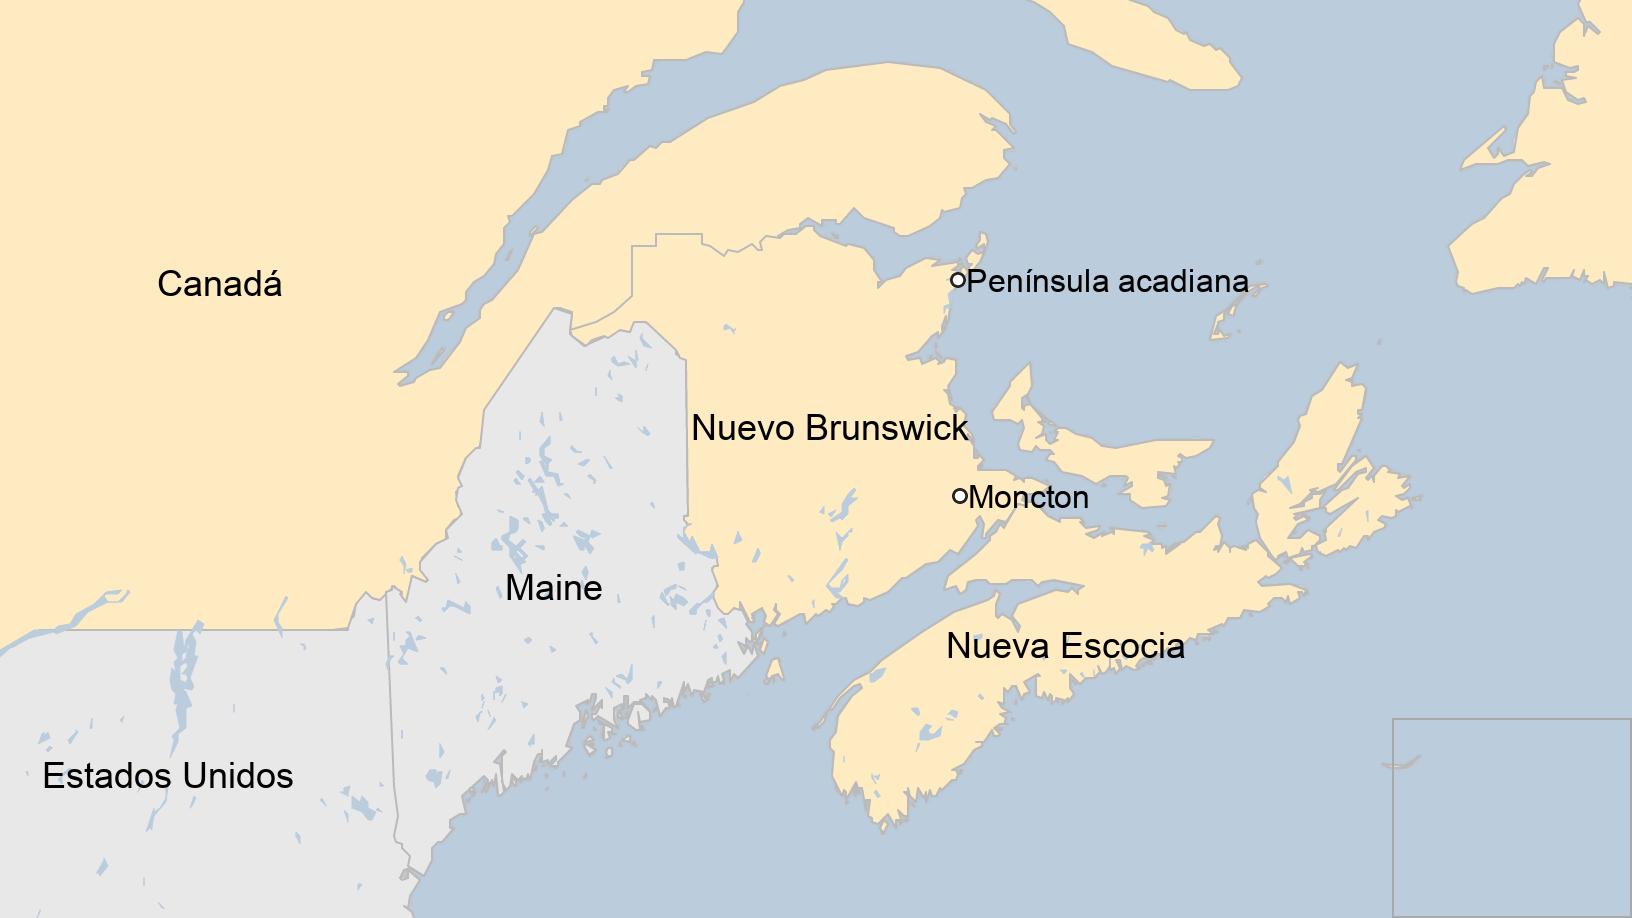 Map: Map showing New Brunswick, Canada